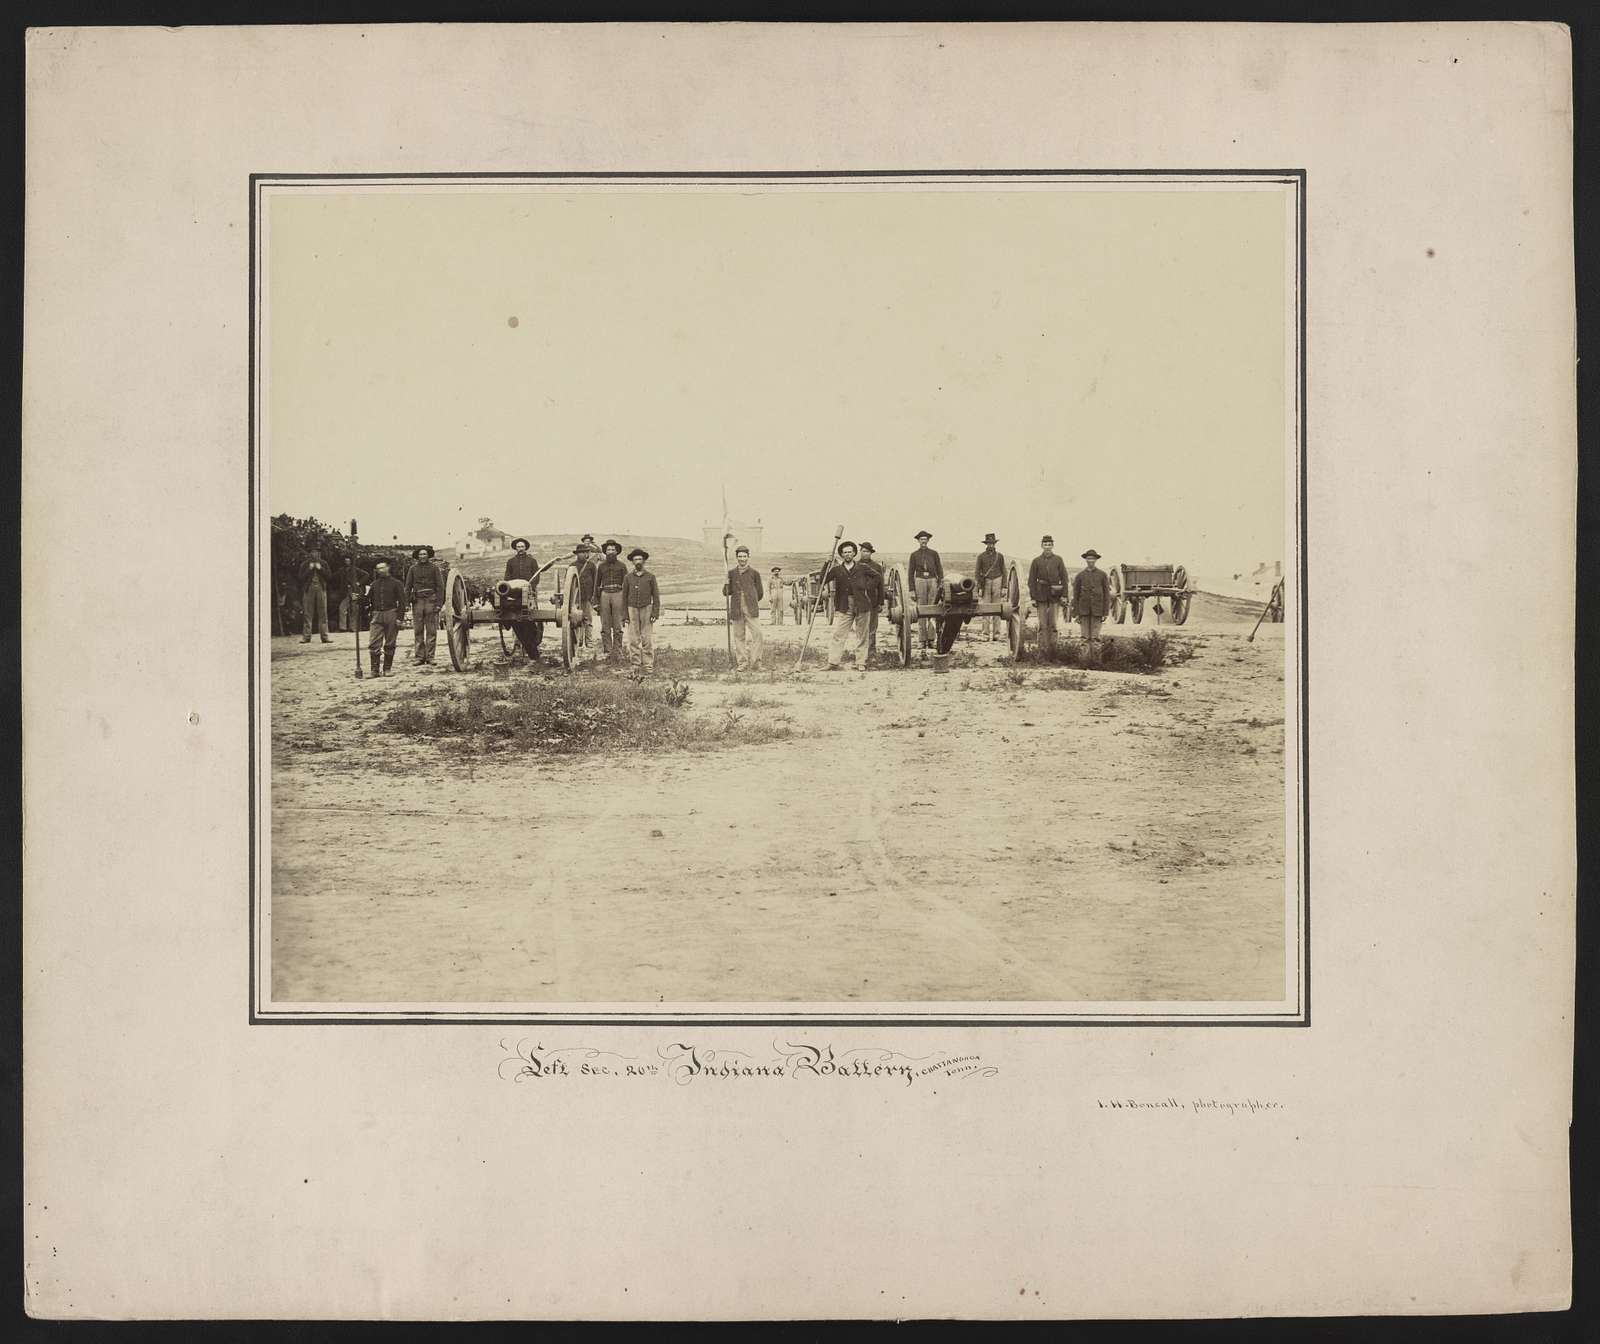 Left sec. 20th Indiana Battery, Chattanooga, Tenn. / I. H. Bonsall, photographer.